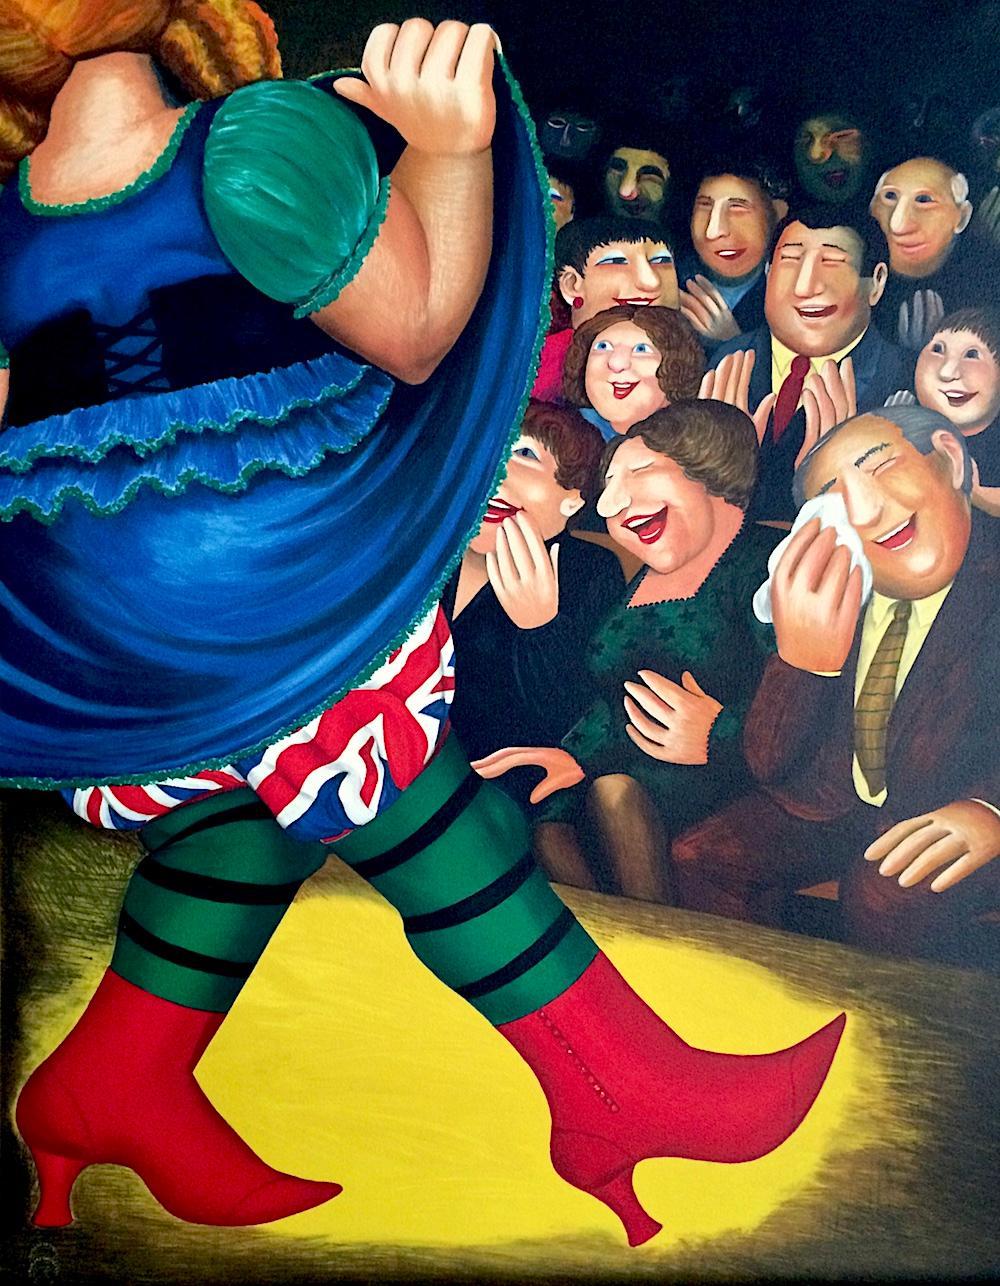 PANTO DAME Signed Lithograph, Woman Dancing, Union Jack, British Humor